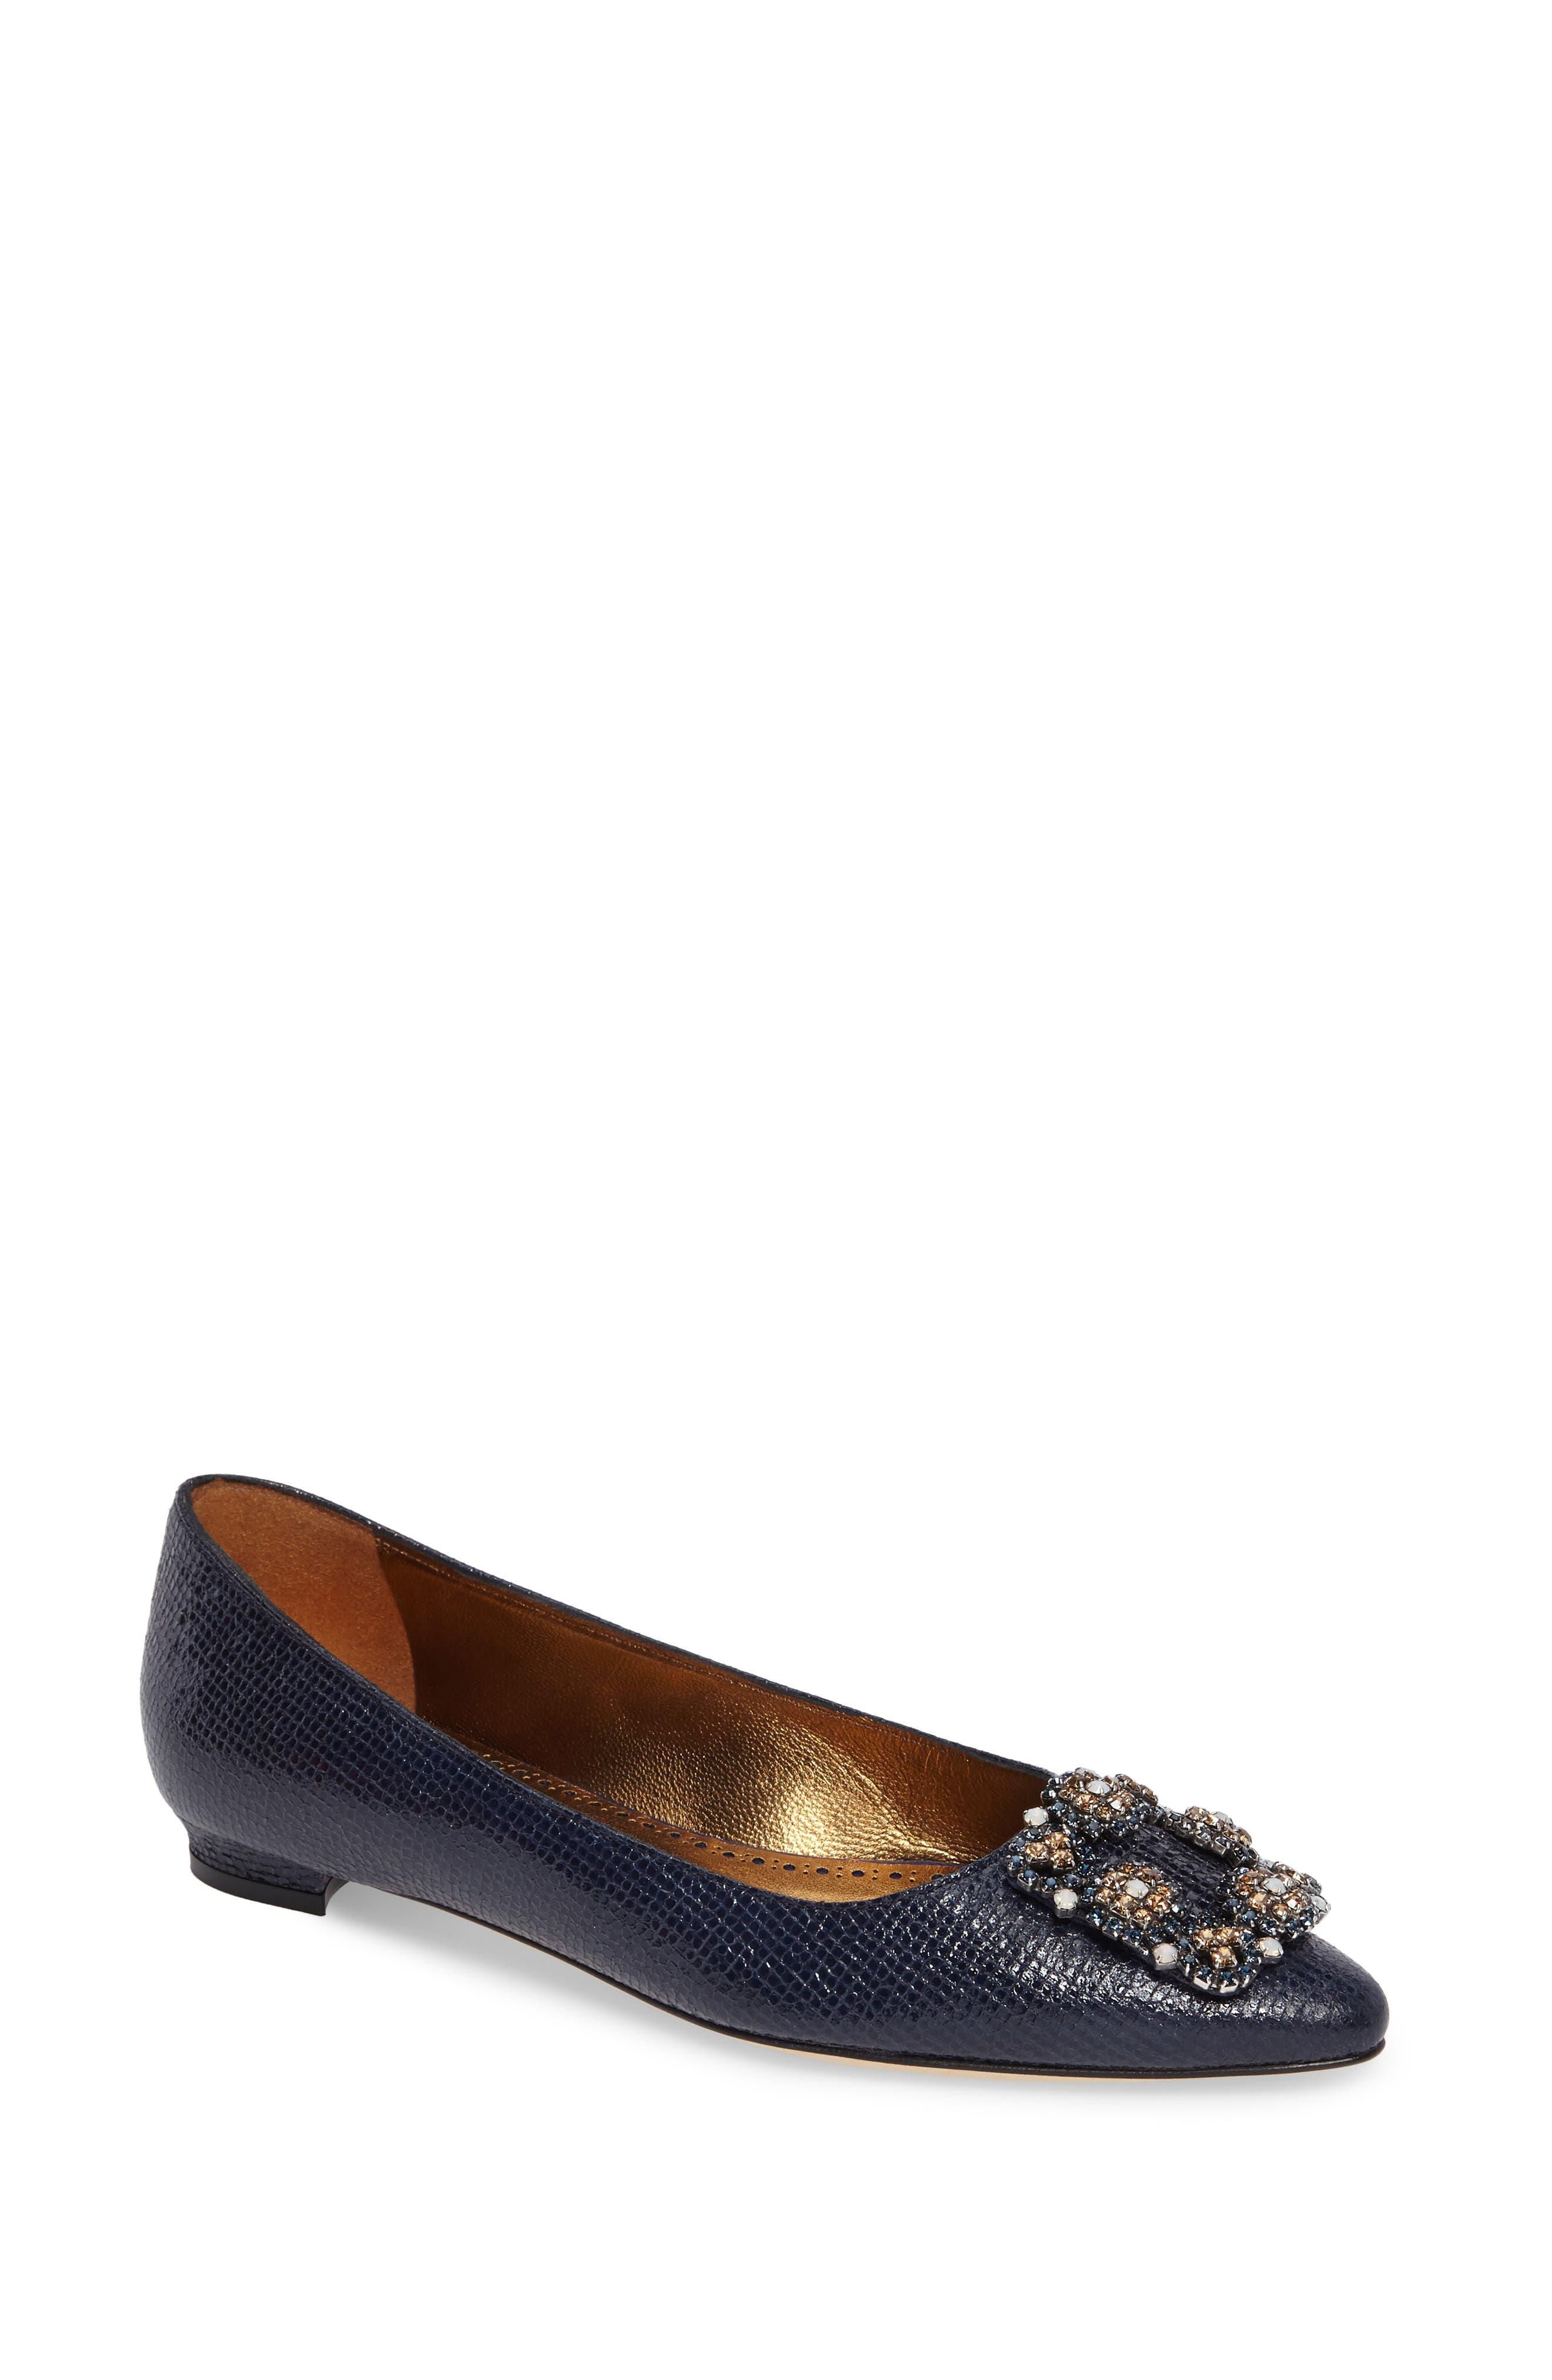 Manolo Blahnik Hangisi Embellished Pointy Toe Flat (Women)